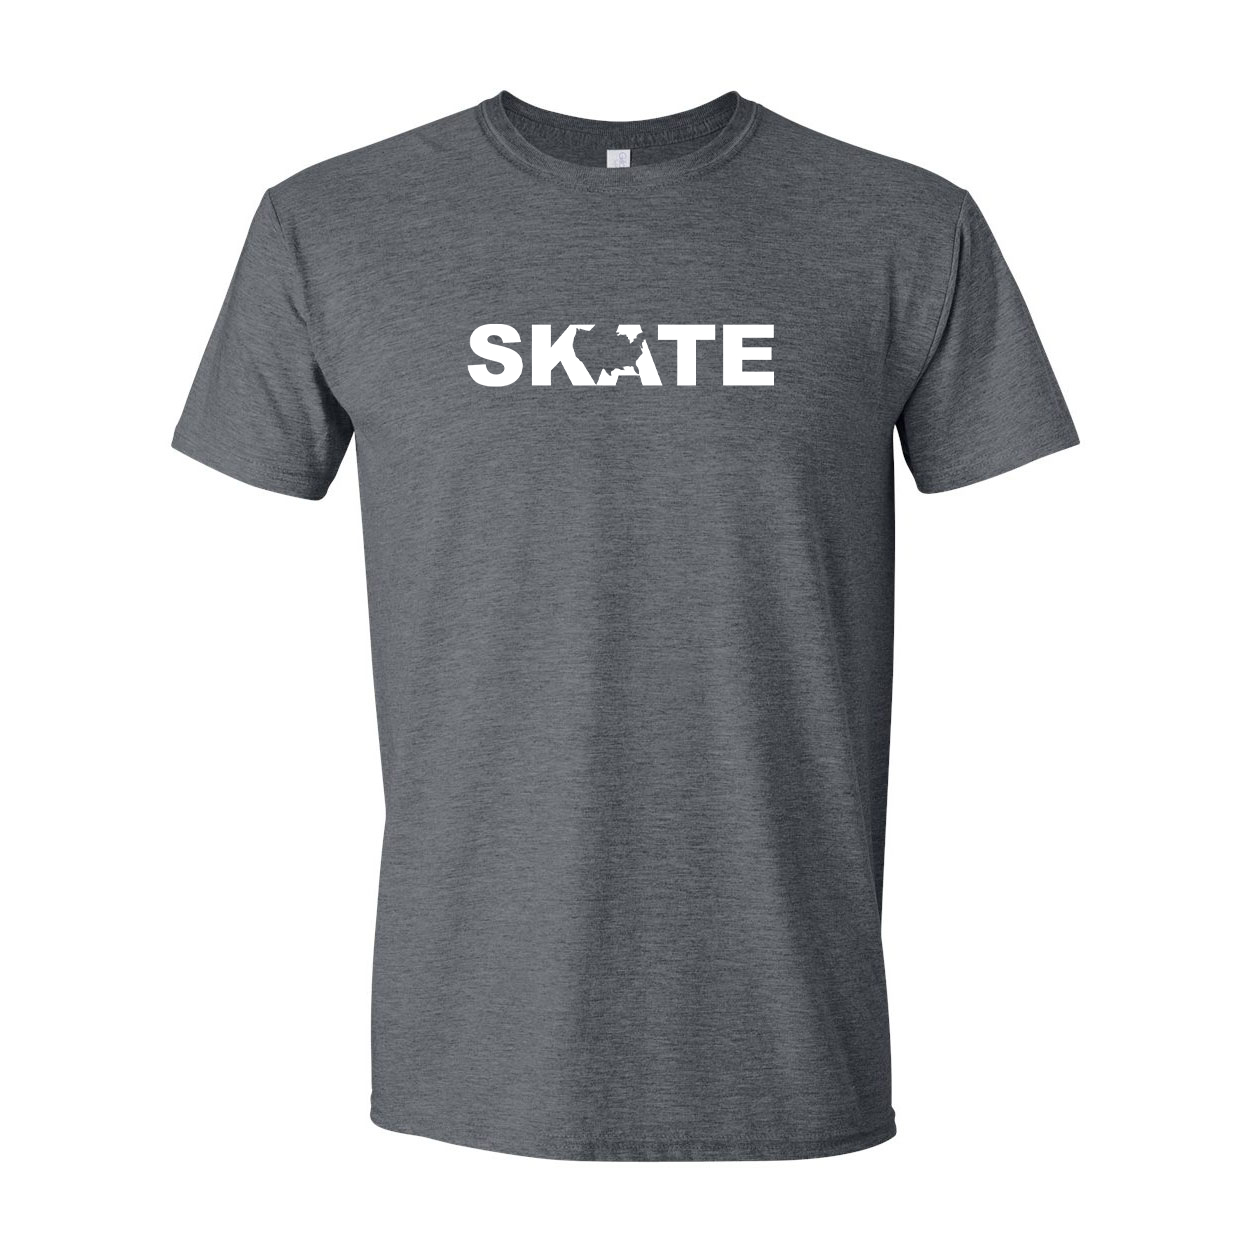 Skate United States Classic T-Shirt Dark Heather Gray (White Logo)